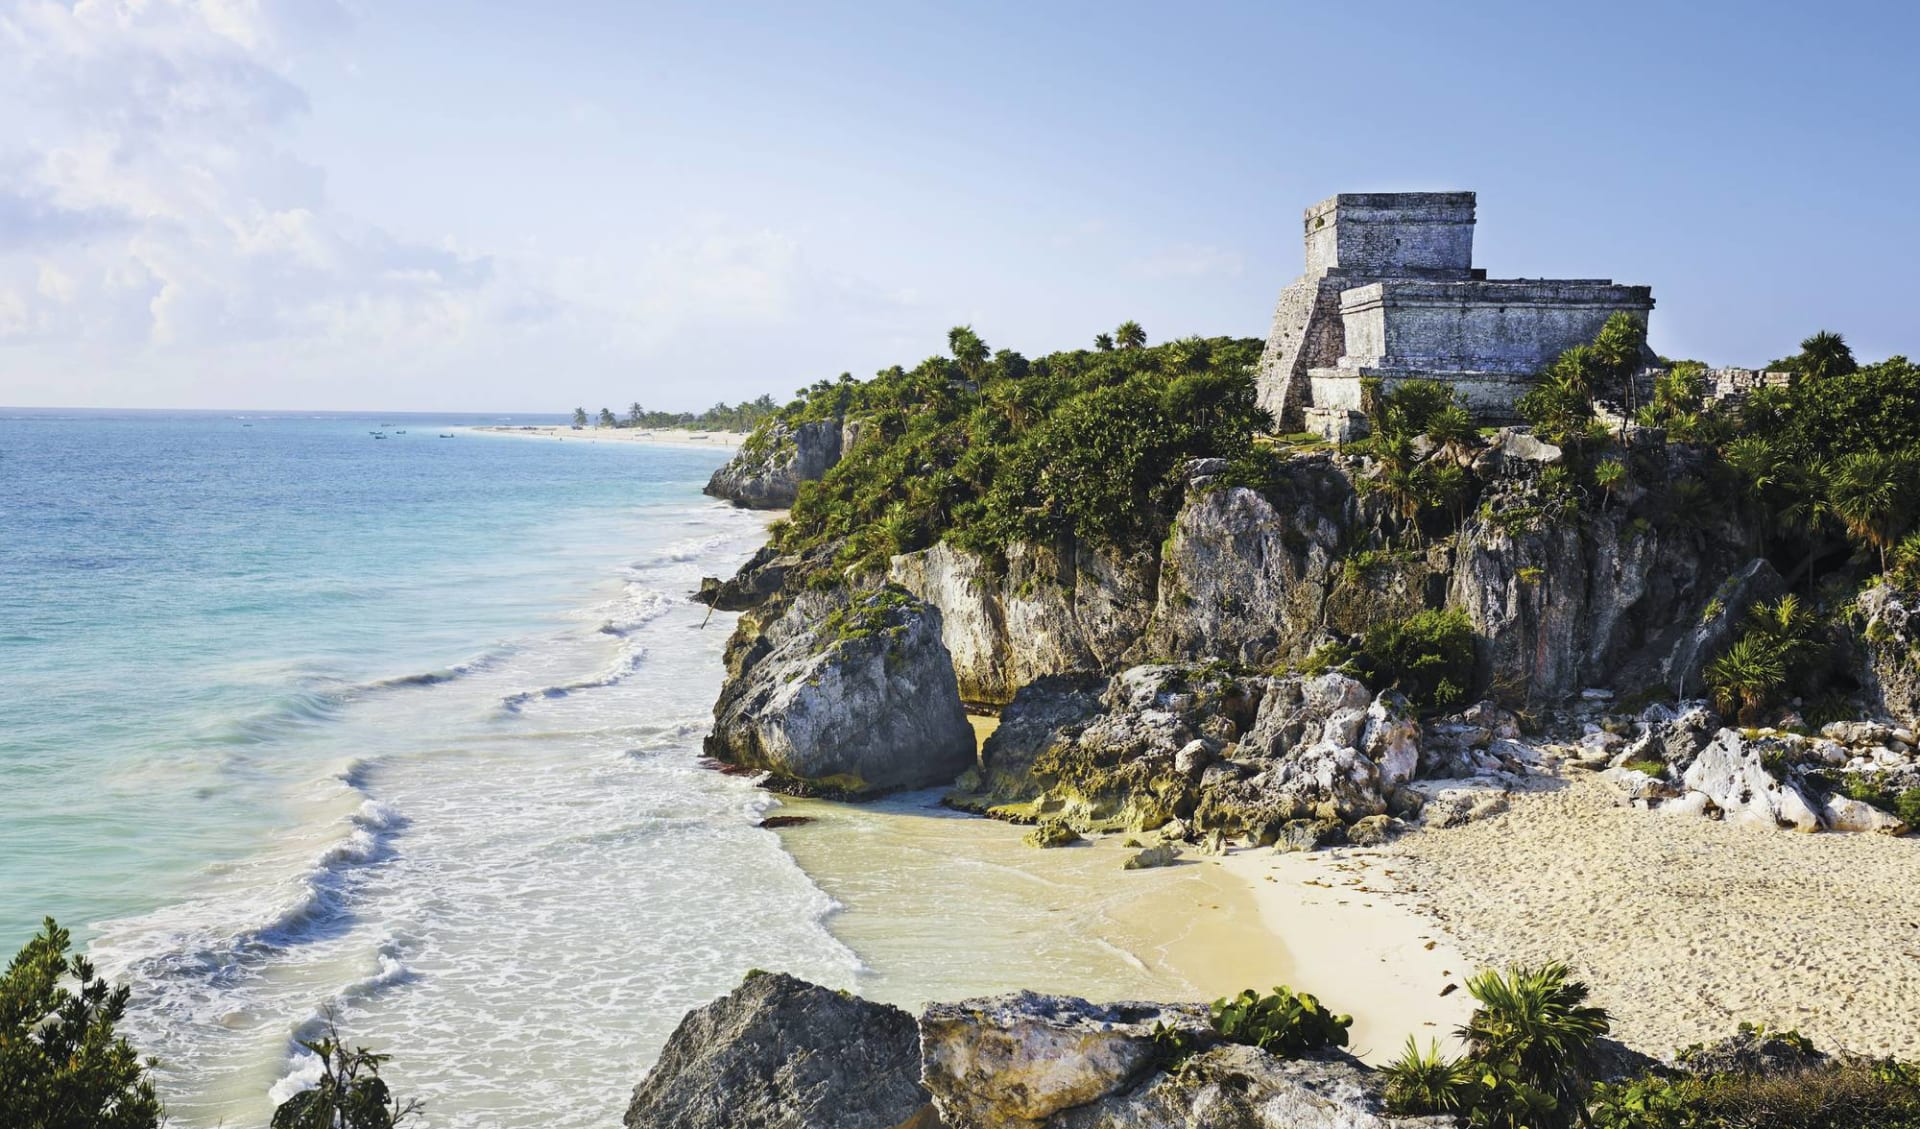 Privatreise Mundo Maya ab Guatemala City: Mexico - Yucatan - Maya Ruinen Tulum